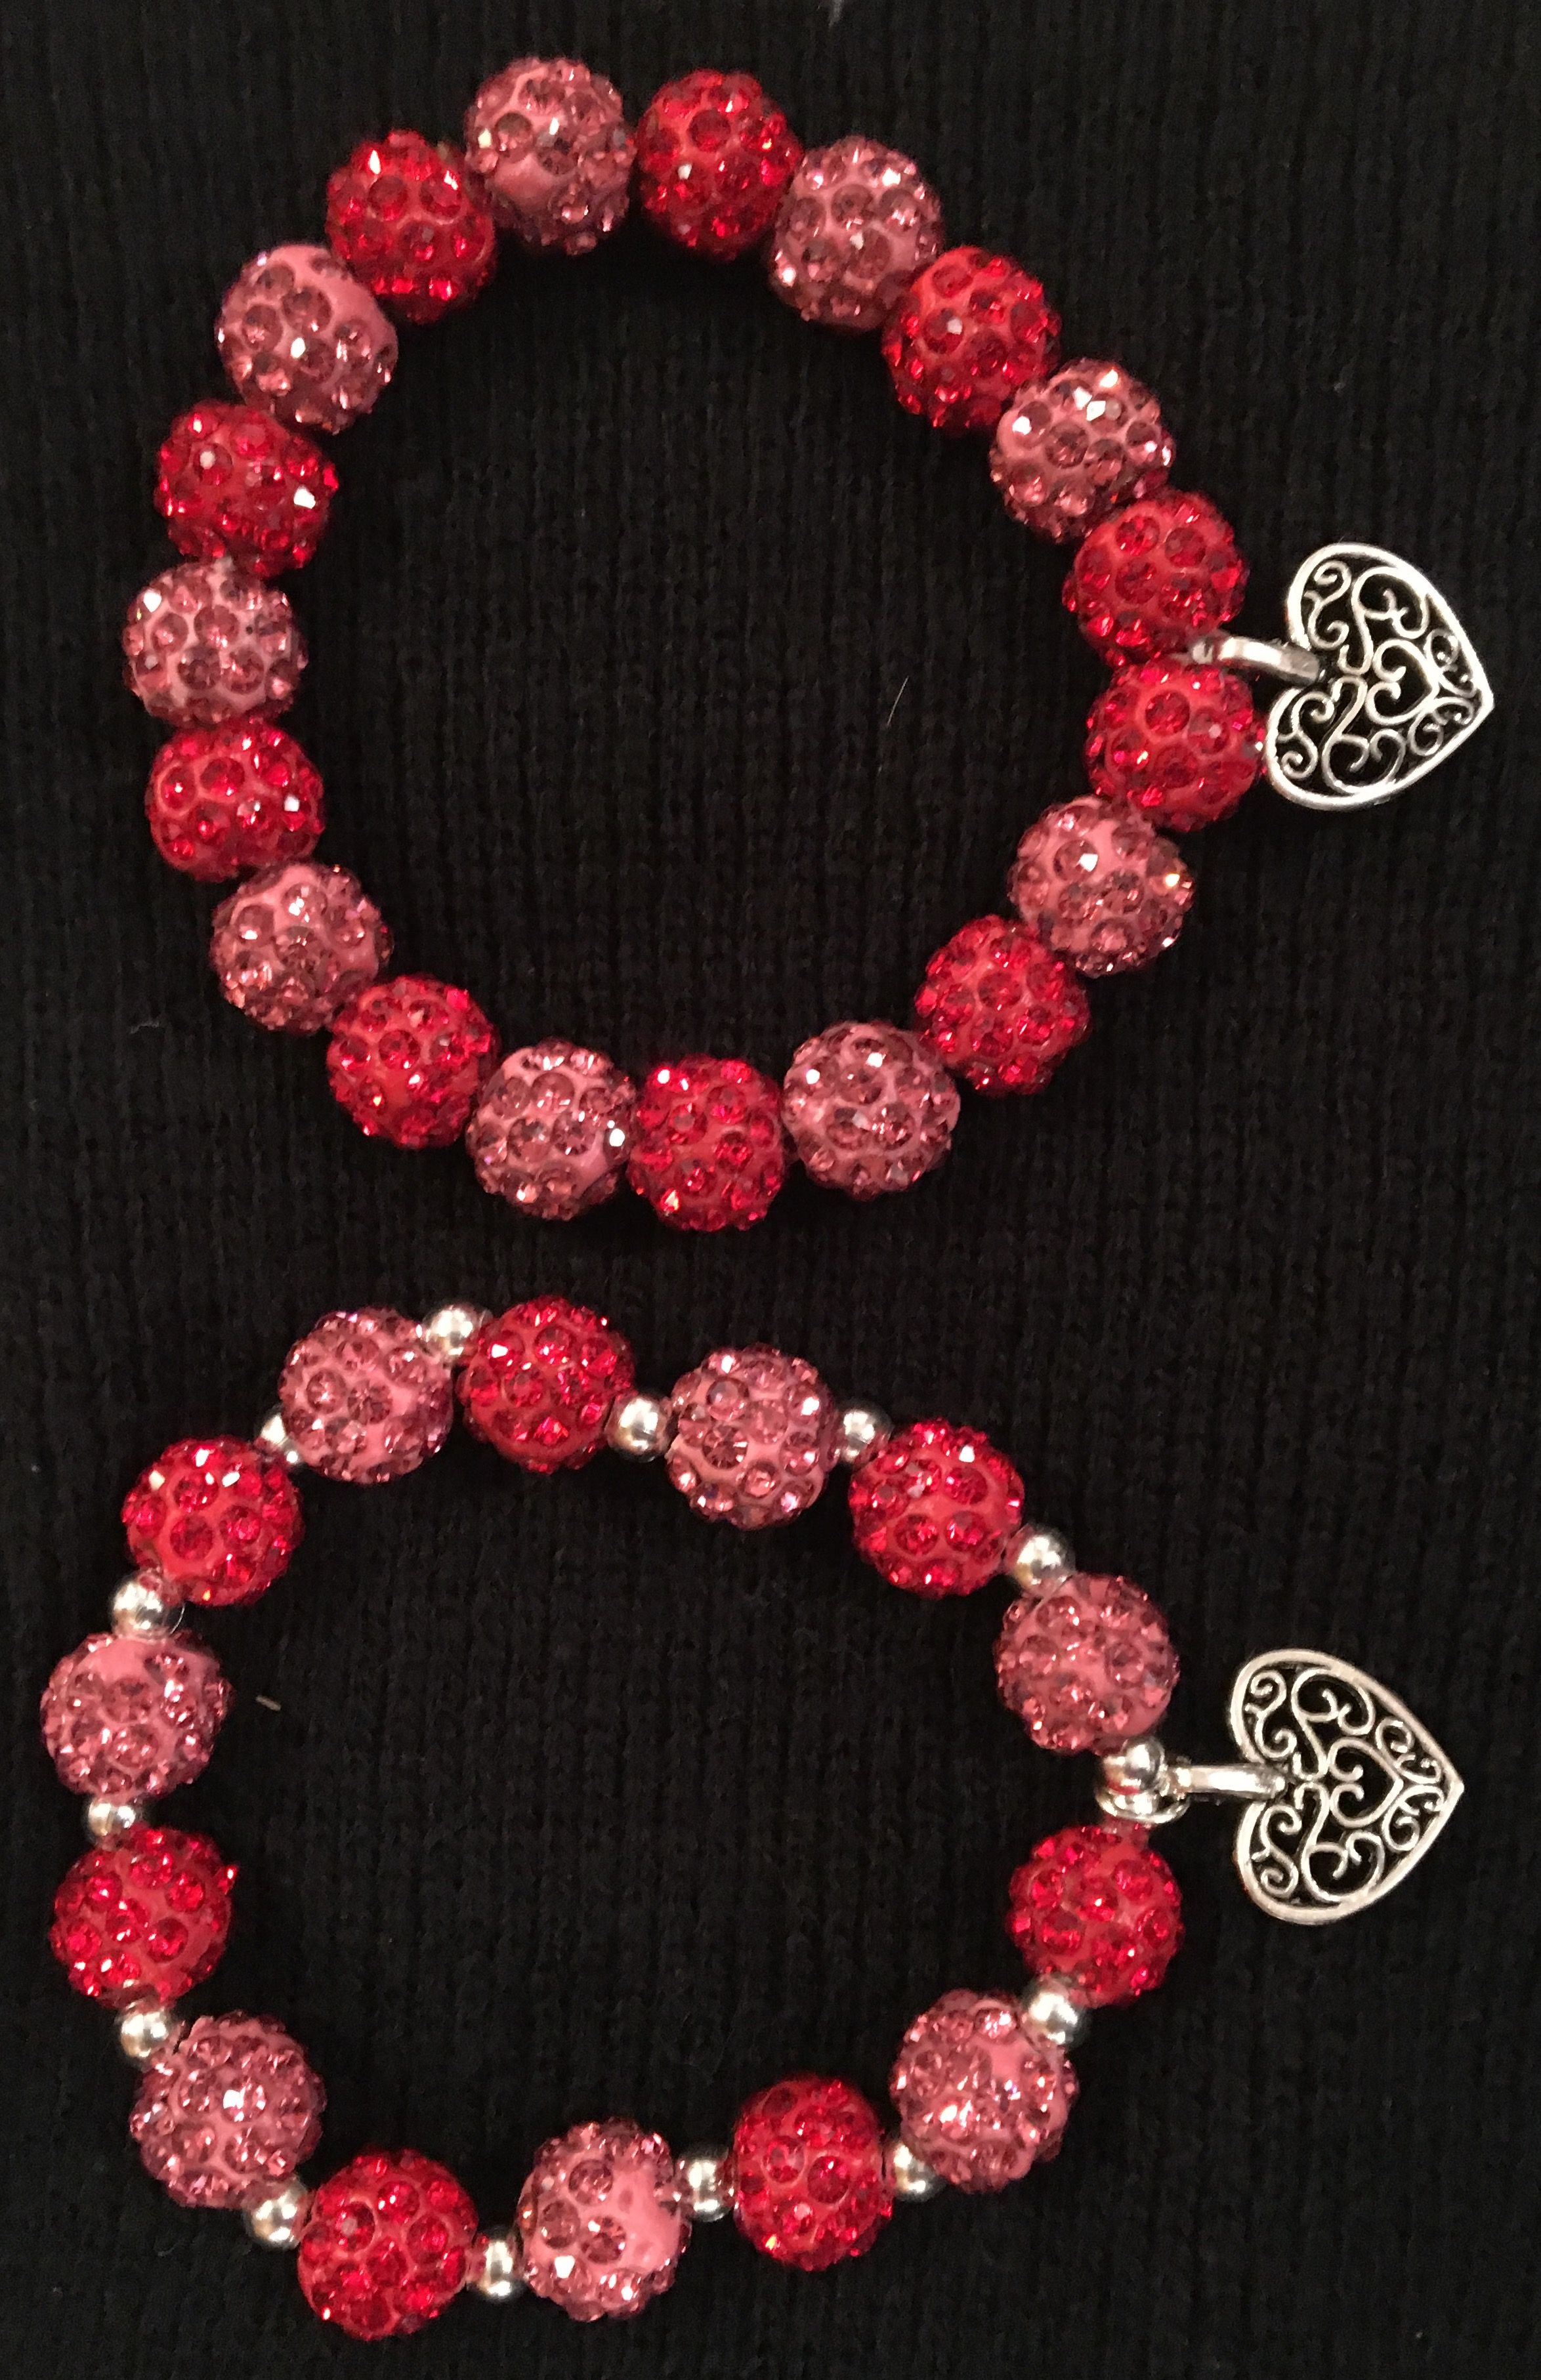 Valentines Bracelets 7 00 Each Simply Pinterest